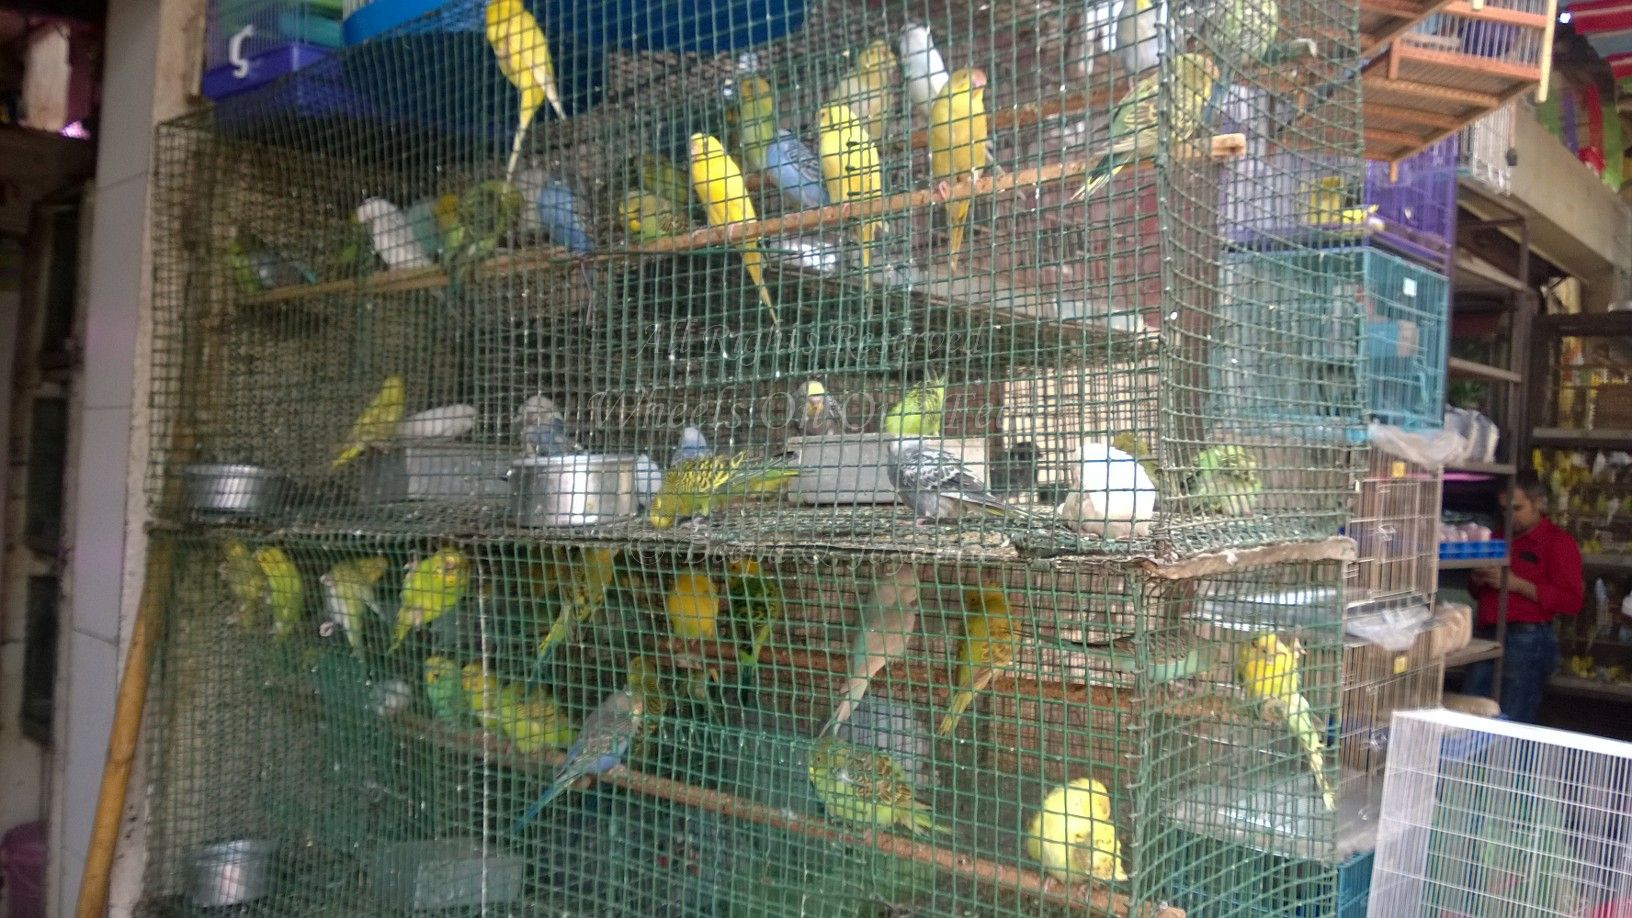 Pet Shops In Mumbais Crawford Market 3 Wheels On Our Feet